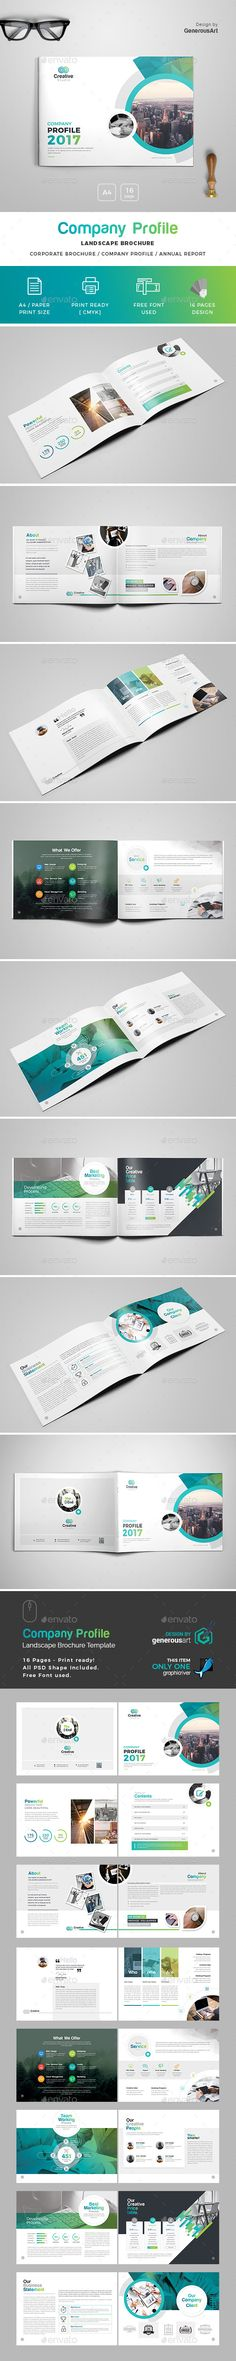 Company Profile Landscape Brochure Template - Brochures Print Templates